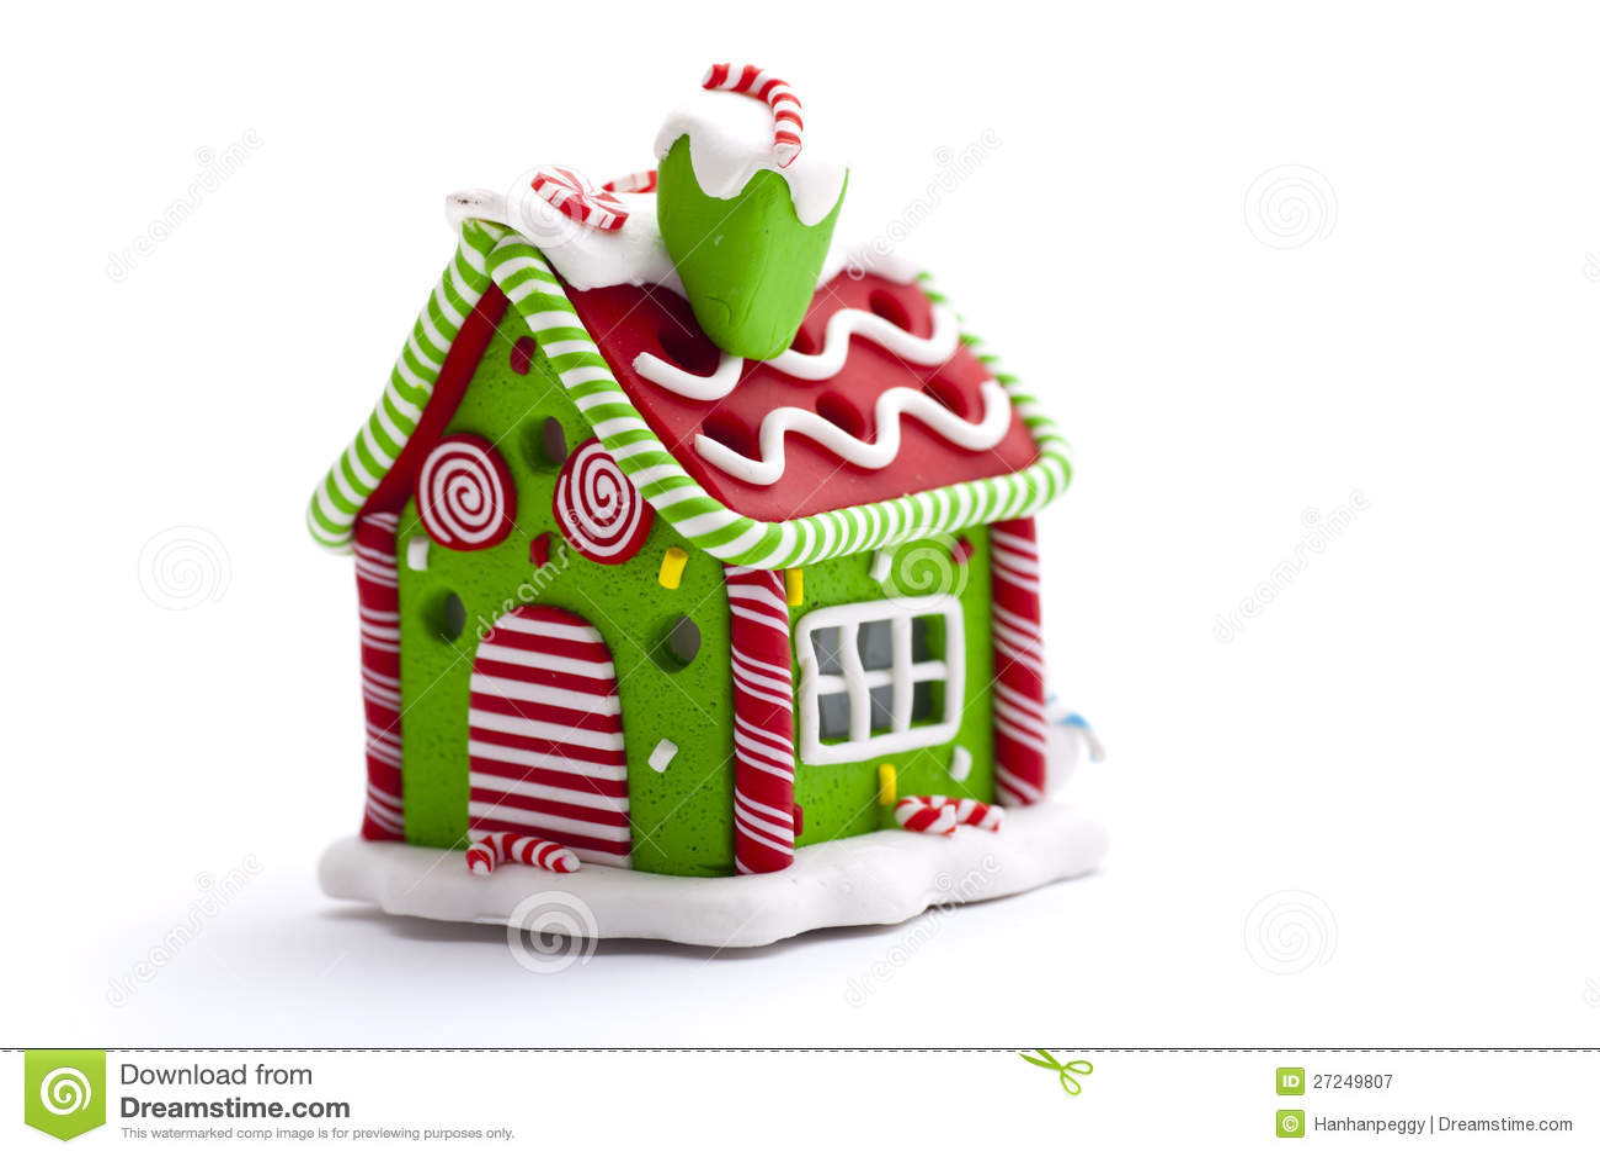 Decoraci n de la casa de pan de jengibre de la navidad for Casa jengibre